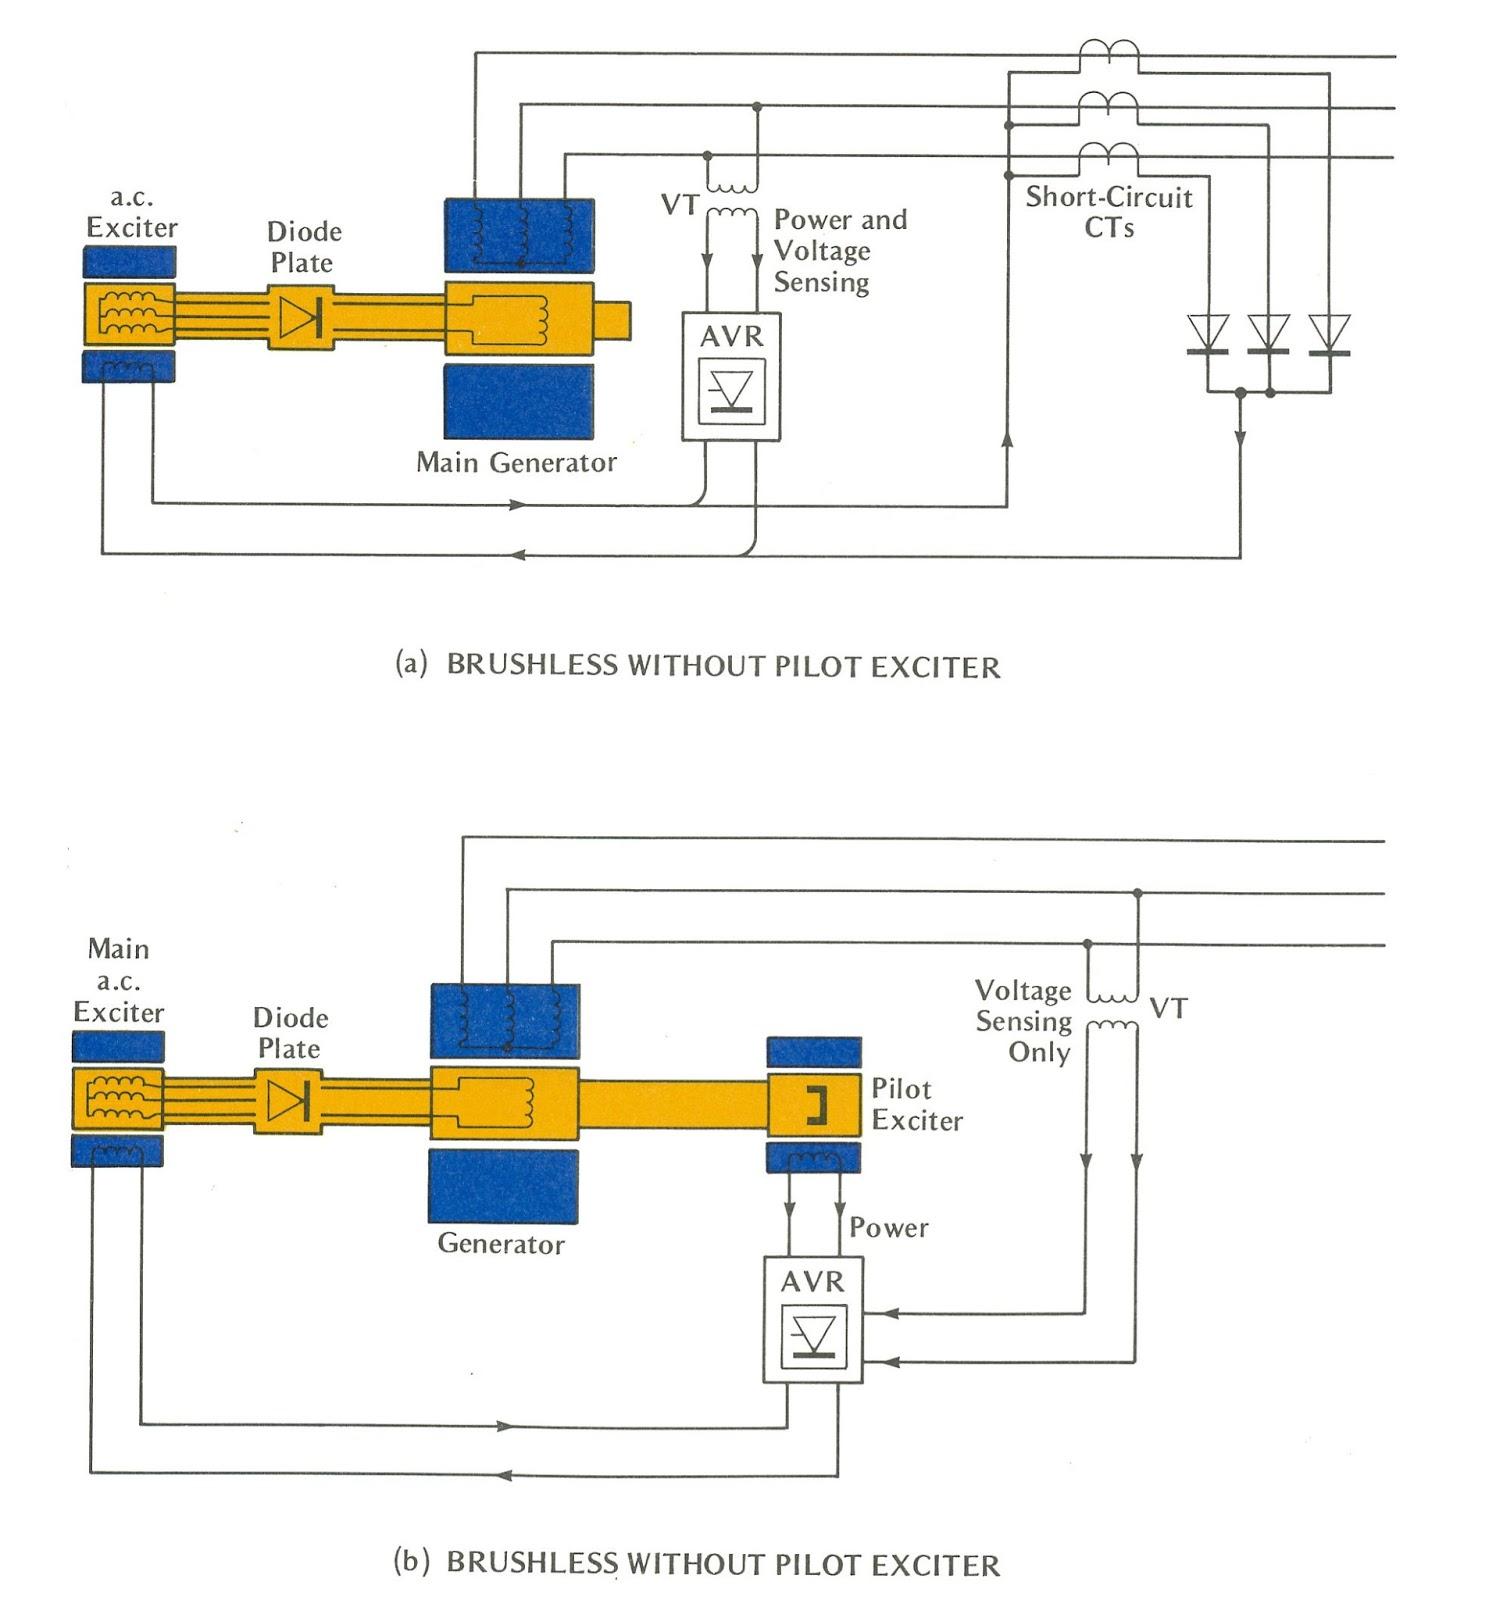 ev_5771] 07 nissan electrical wiring diagram ac rouge 07 nissan electrical wiring diagram ac rouge 2012 nissan quest ac relay location kweca tran vira favo mohammedshrine librar wiring 101